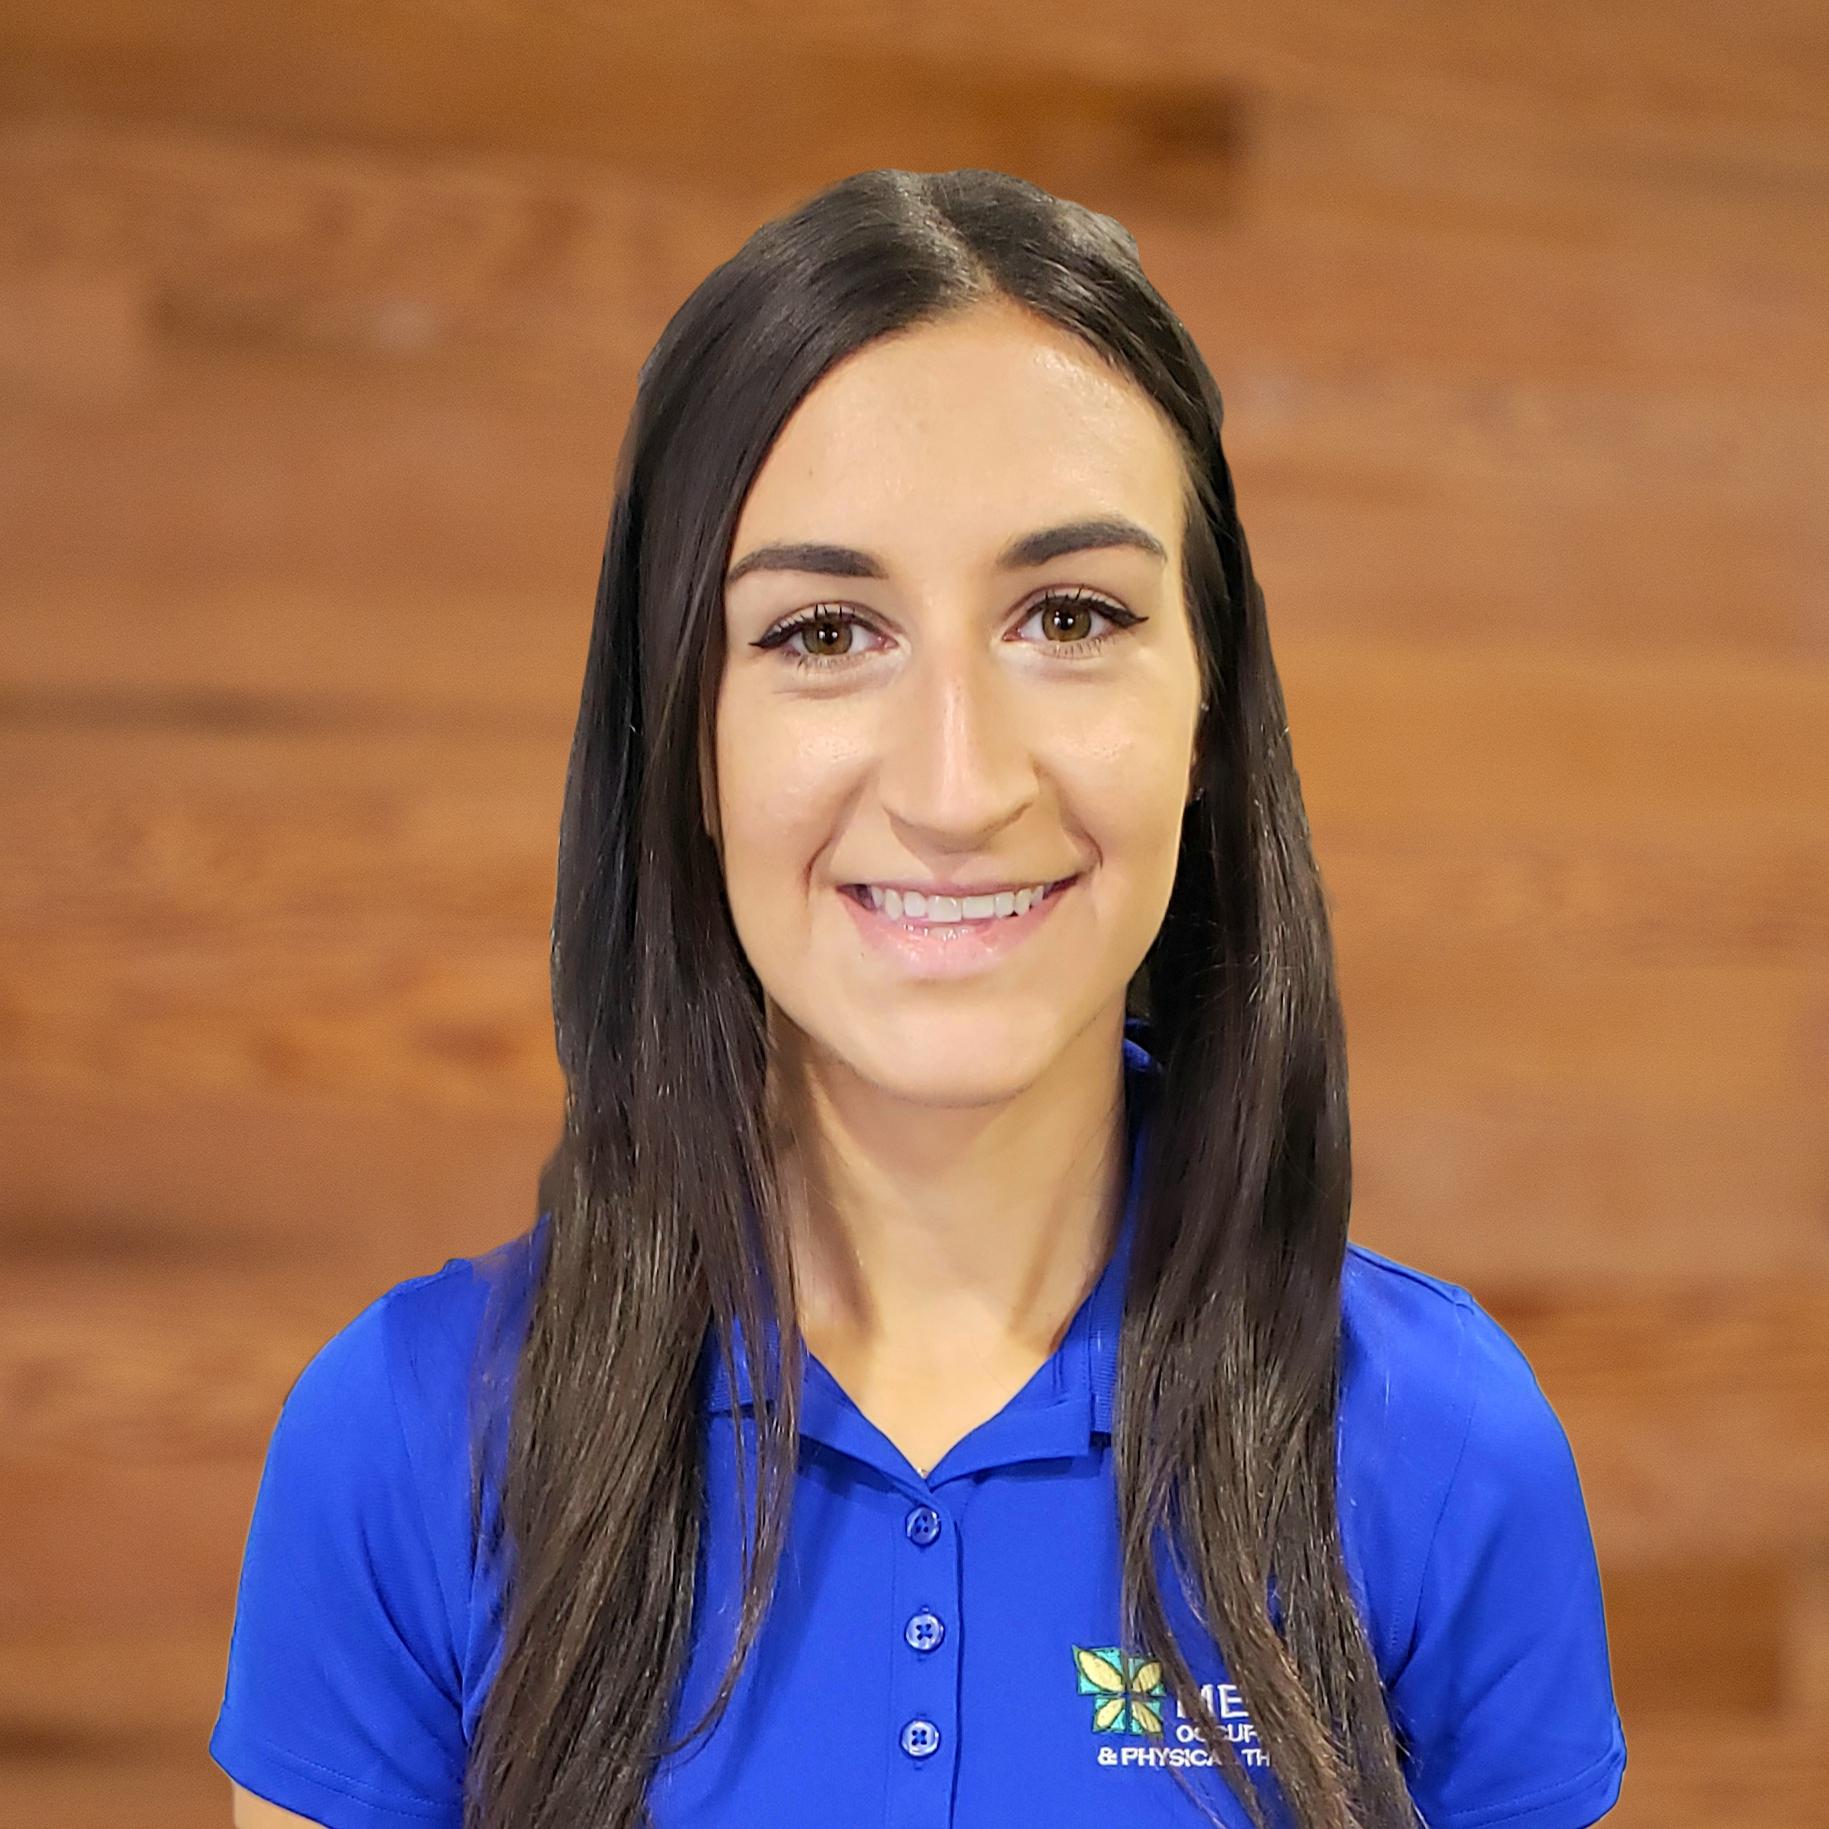 Katarina Narouz, PT, DPT - OrthopedicInjury Prevention